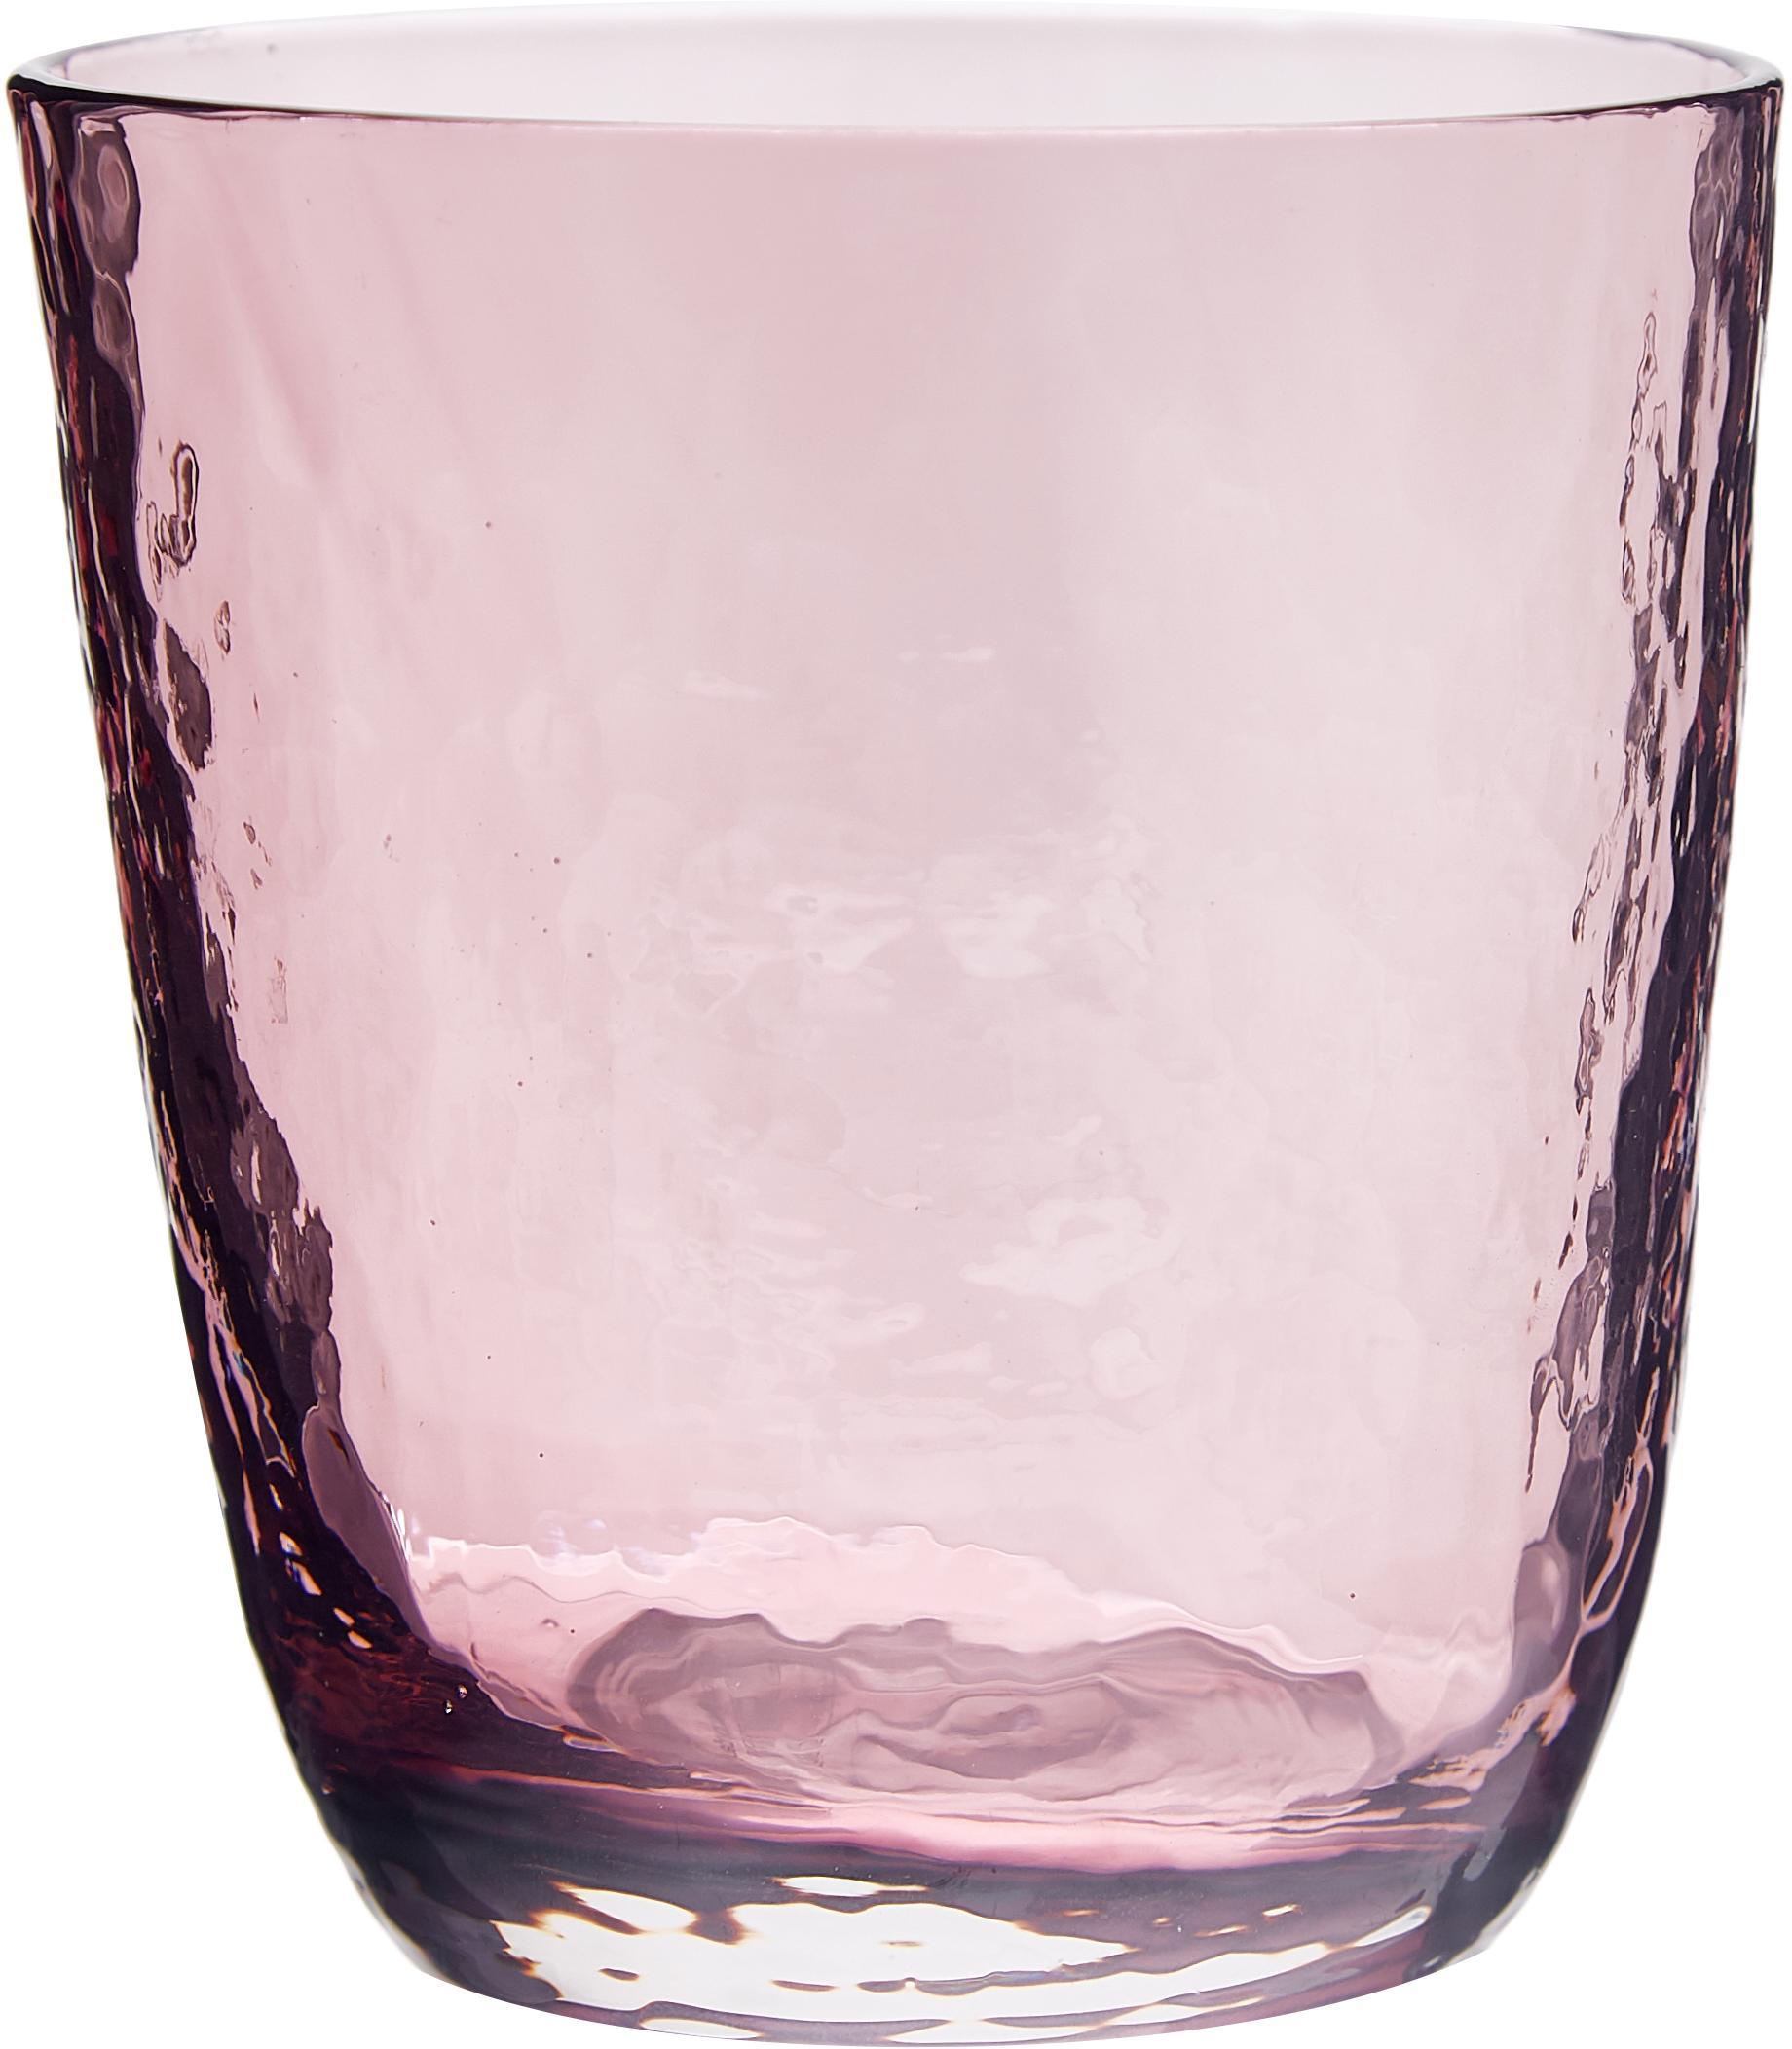 Vasos de vidrio soplado Hammered, 4uds., Vidrio soplado, Lila, transparente, Ø 9 x Al 10 cm